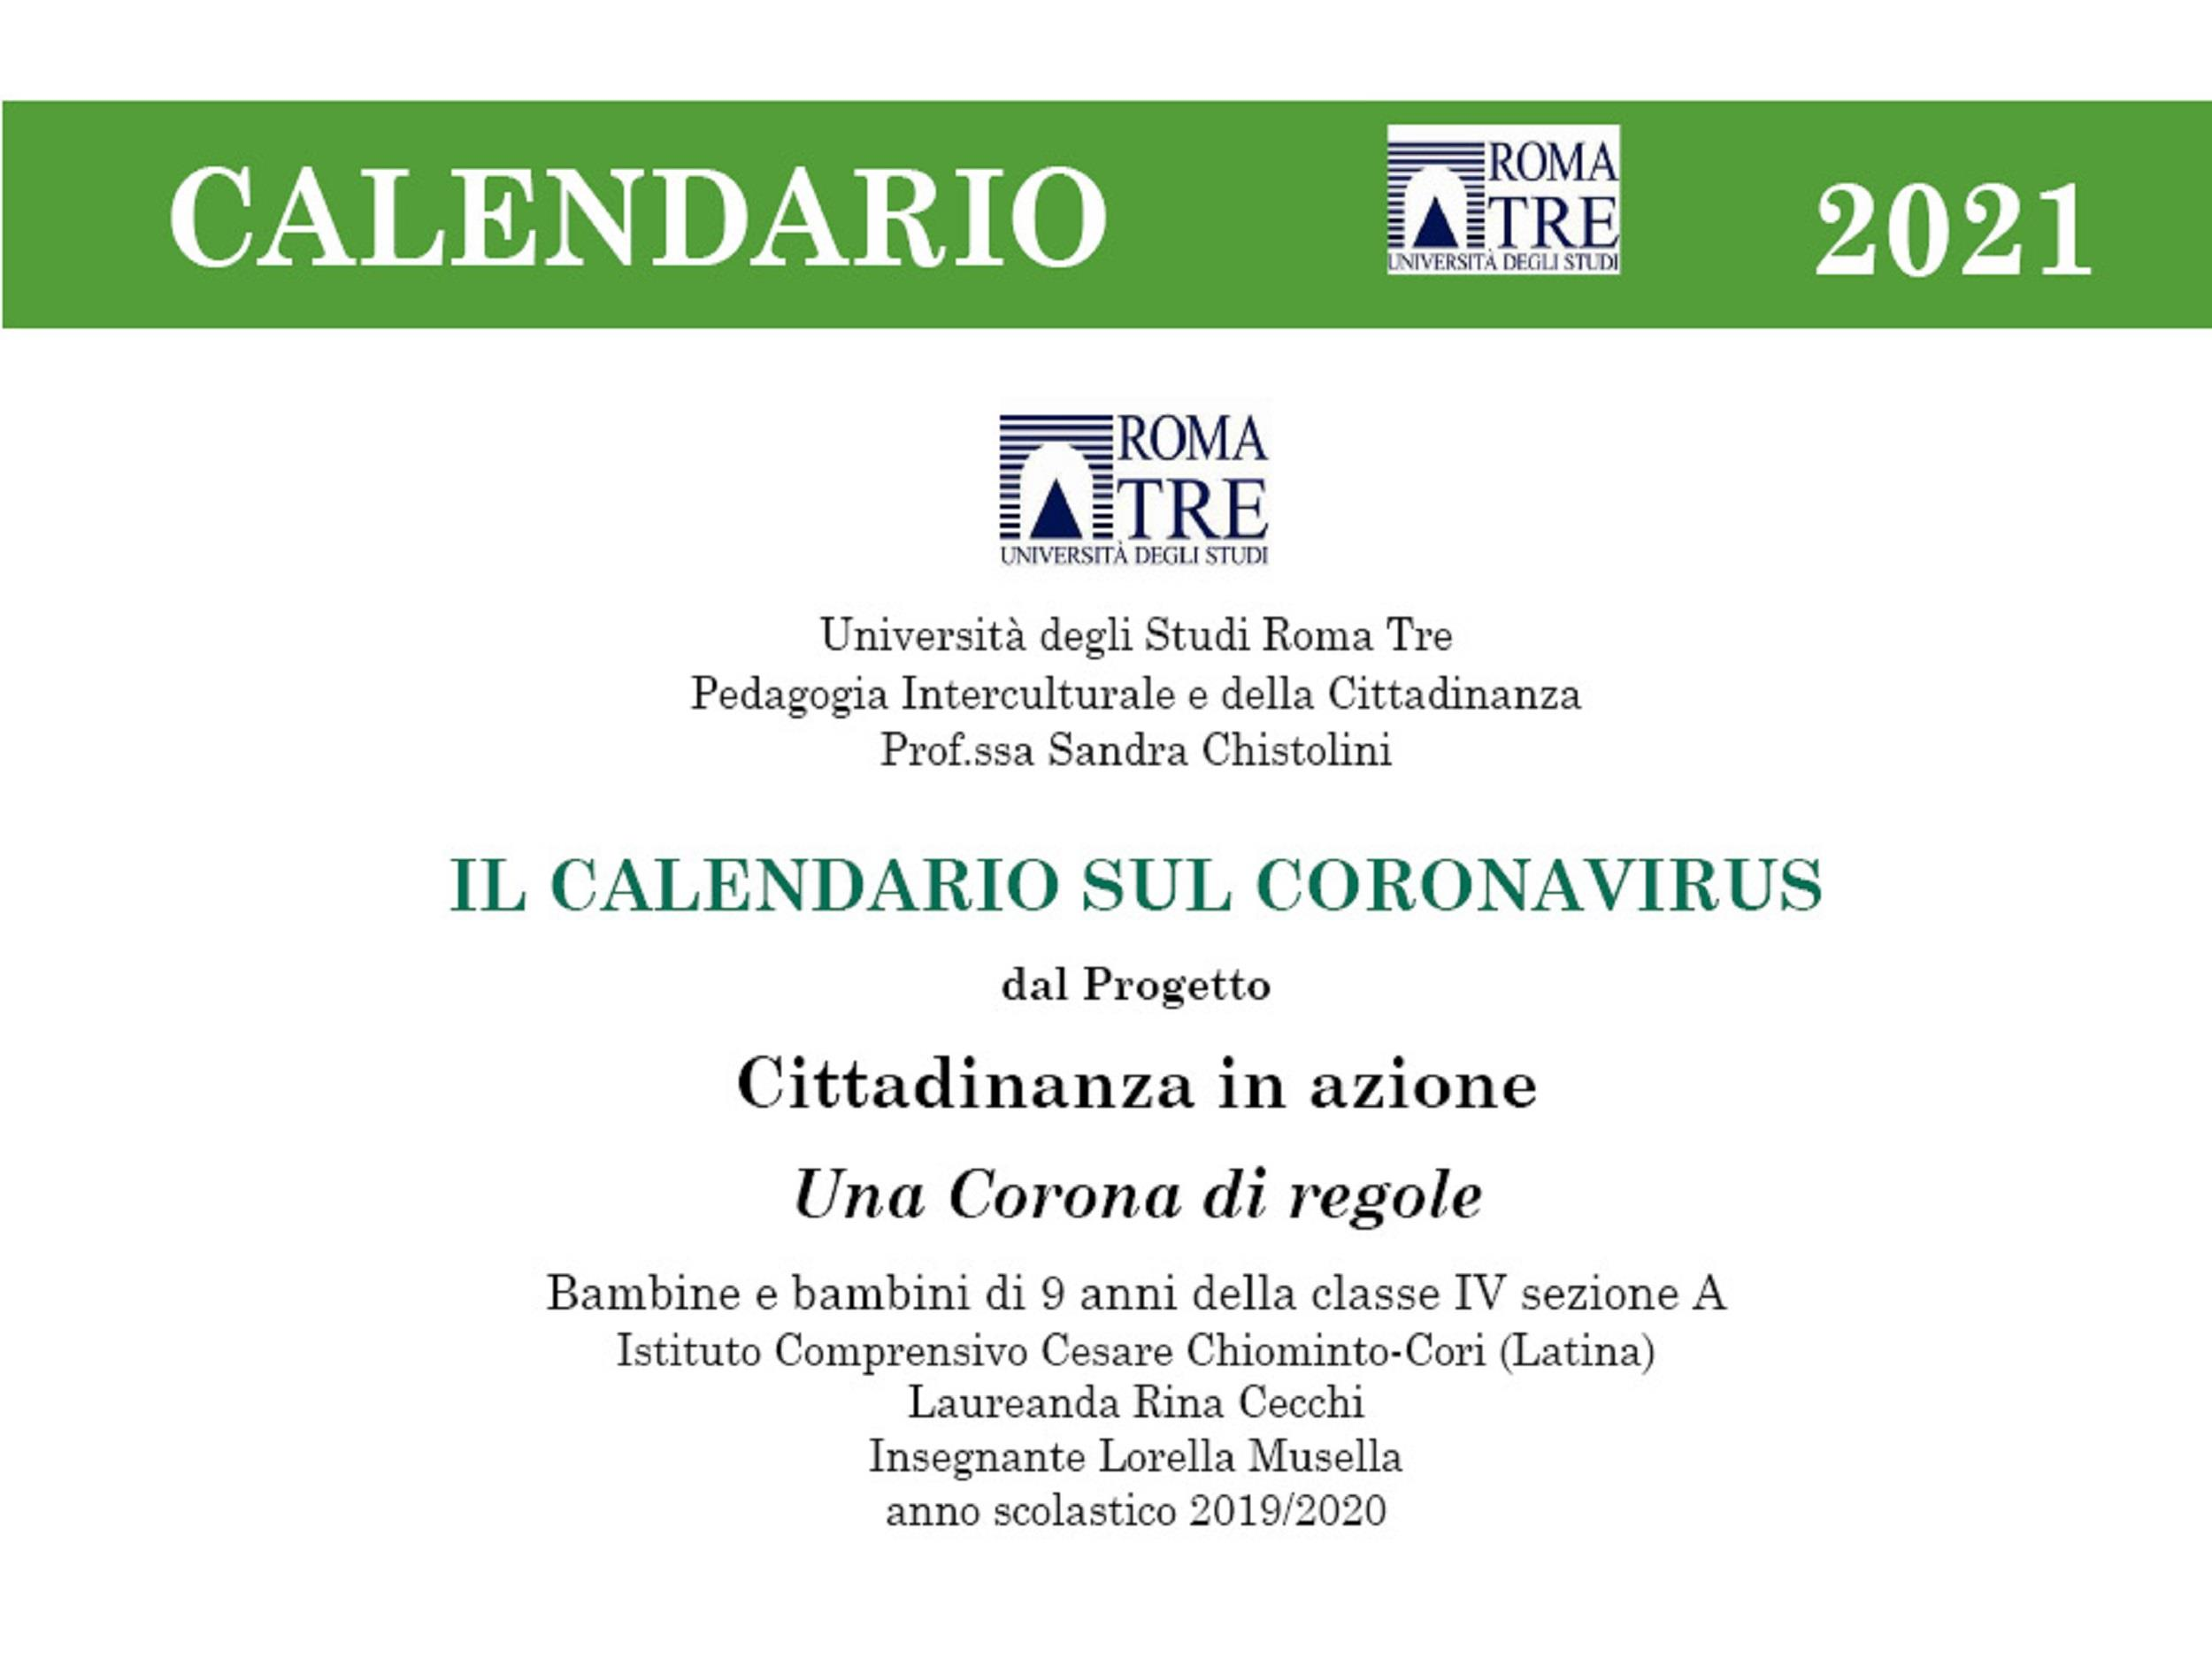 Il Calendario sul Coronavirus 2021